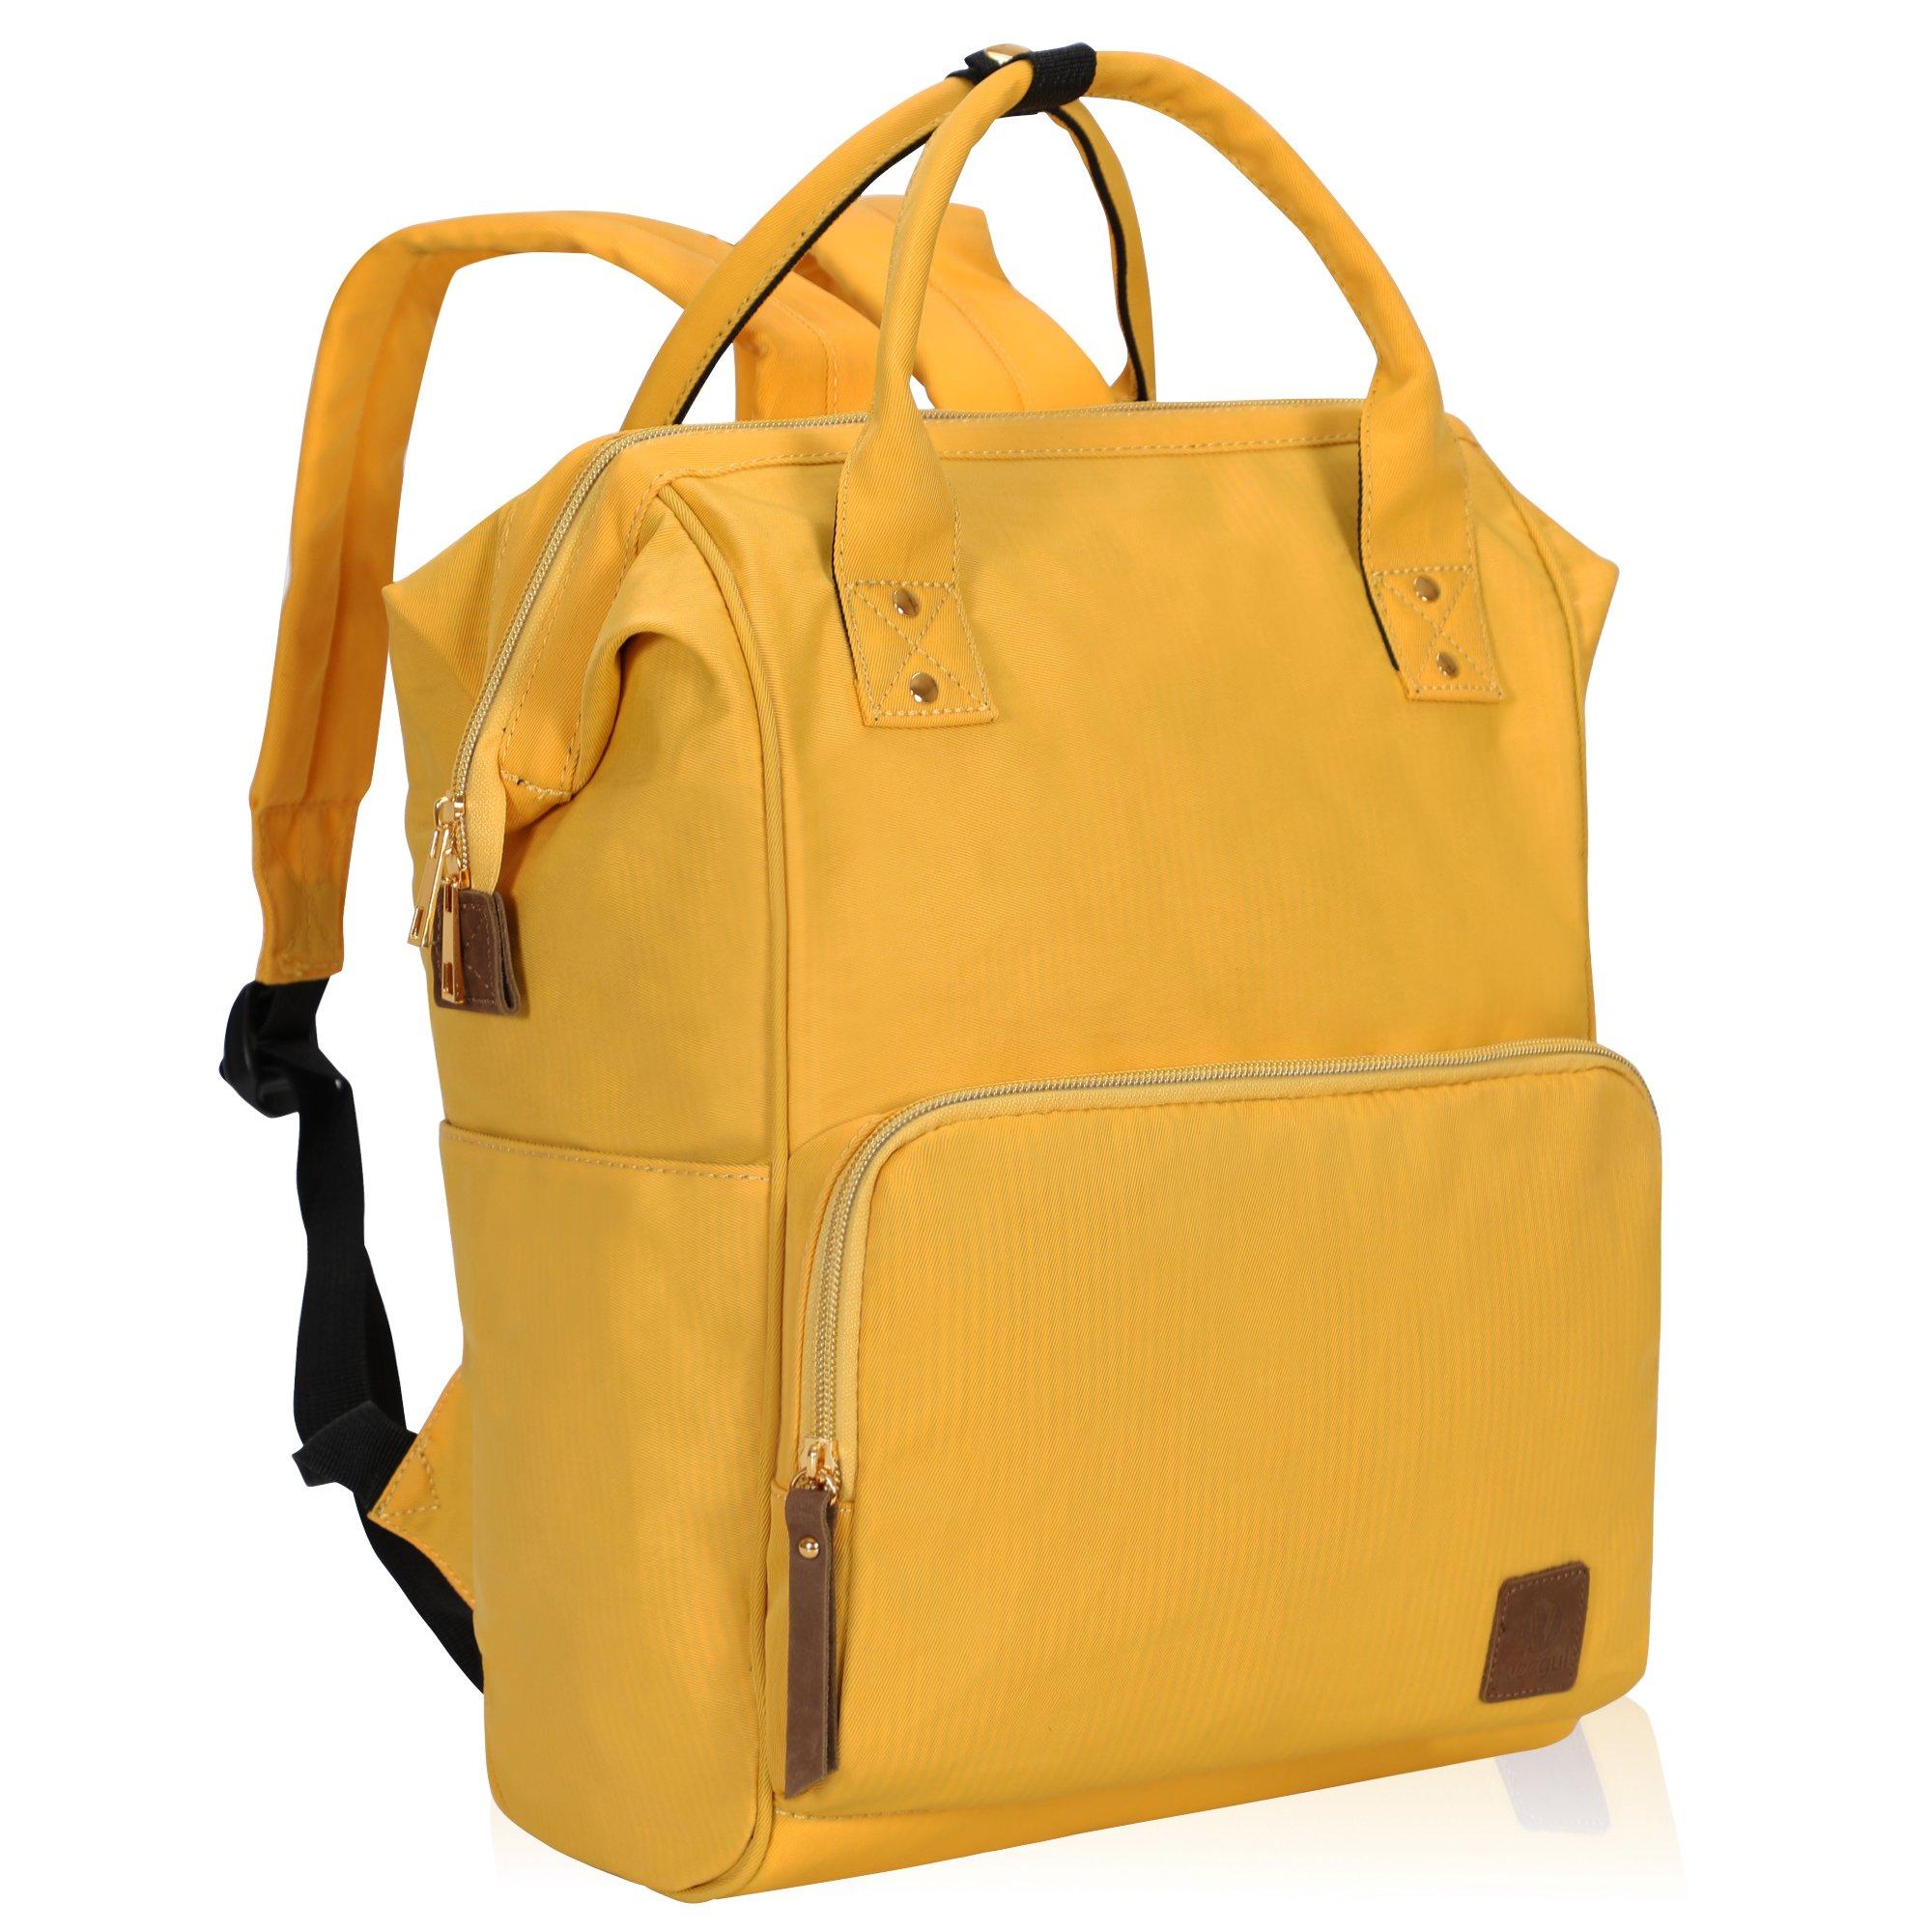 f813194972f1 Veegul Wide Open Multipurpose Travel Backpack Lightweight Casual Daypack  18L Calendula Yellow